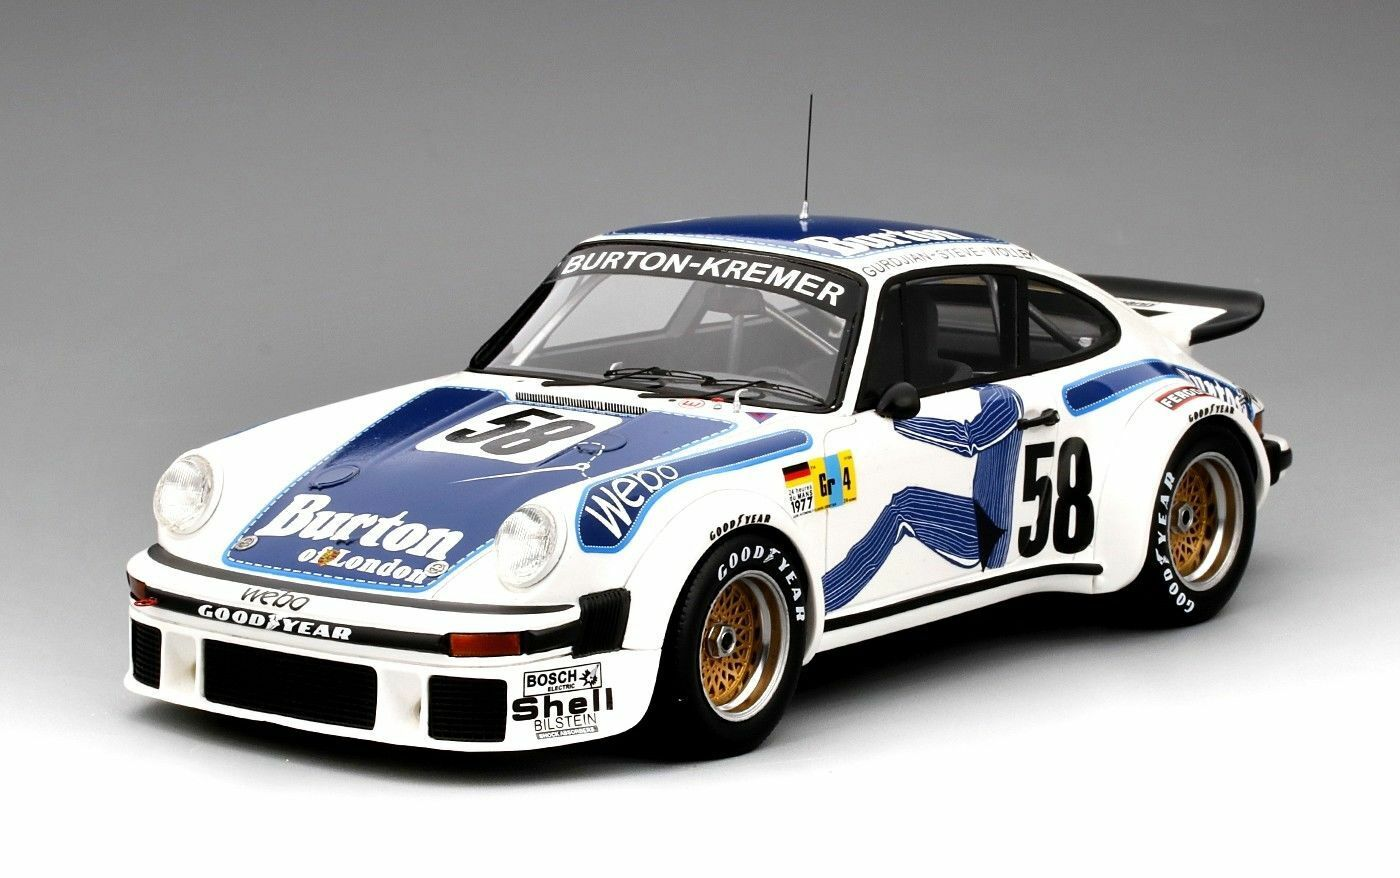 Top Speed 1977 Porsche 934  58 Kremer Class Win.Le Mans TS0057 1:18 Nuovo Item